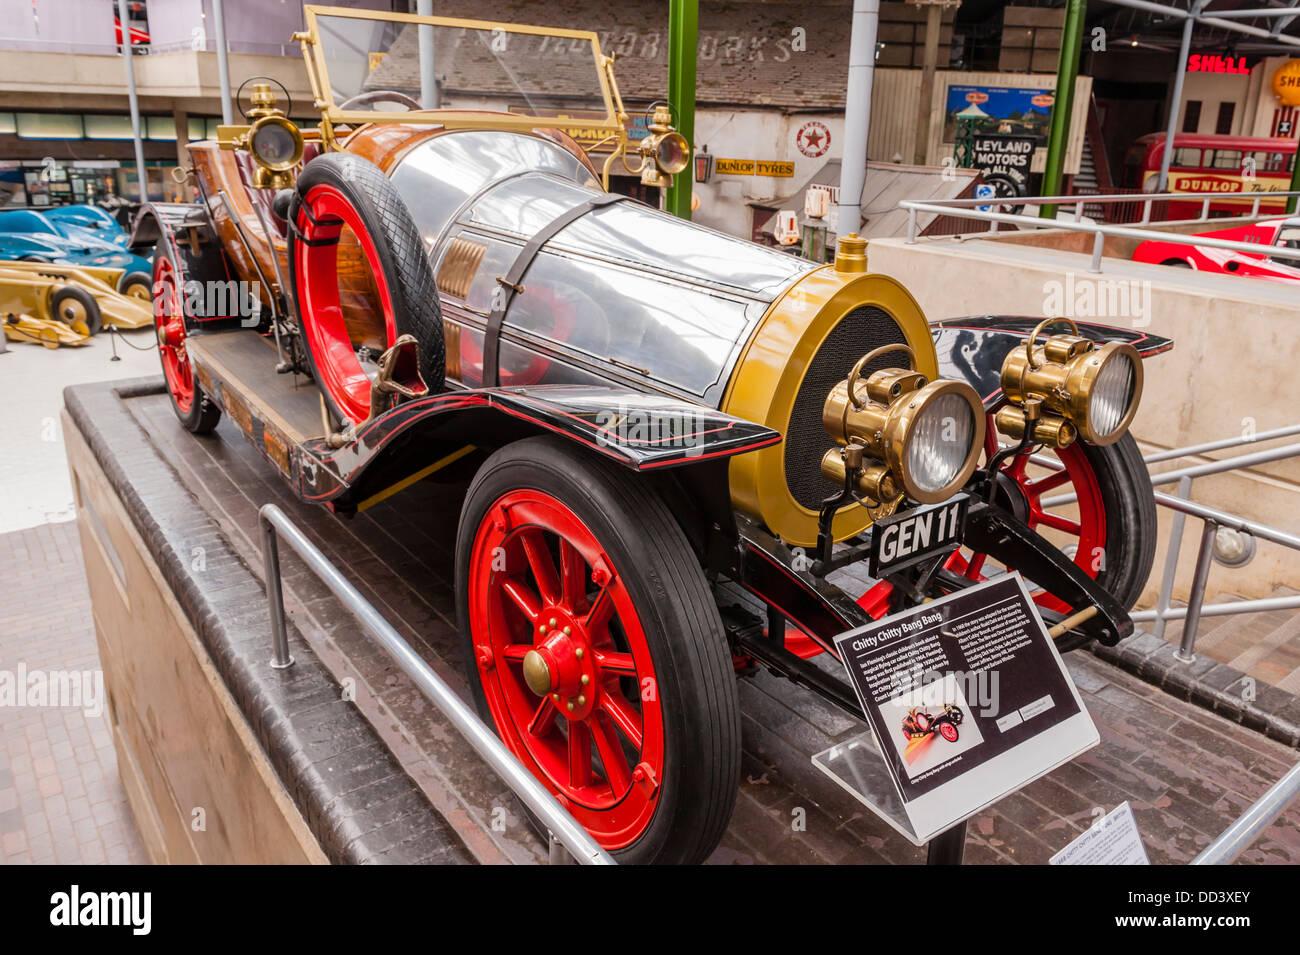 Chitty Chitty Bang Bang Inside The National Motor Museum